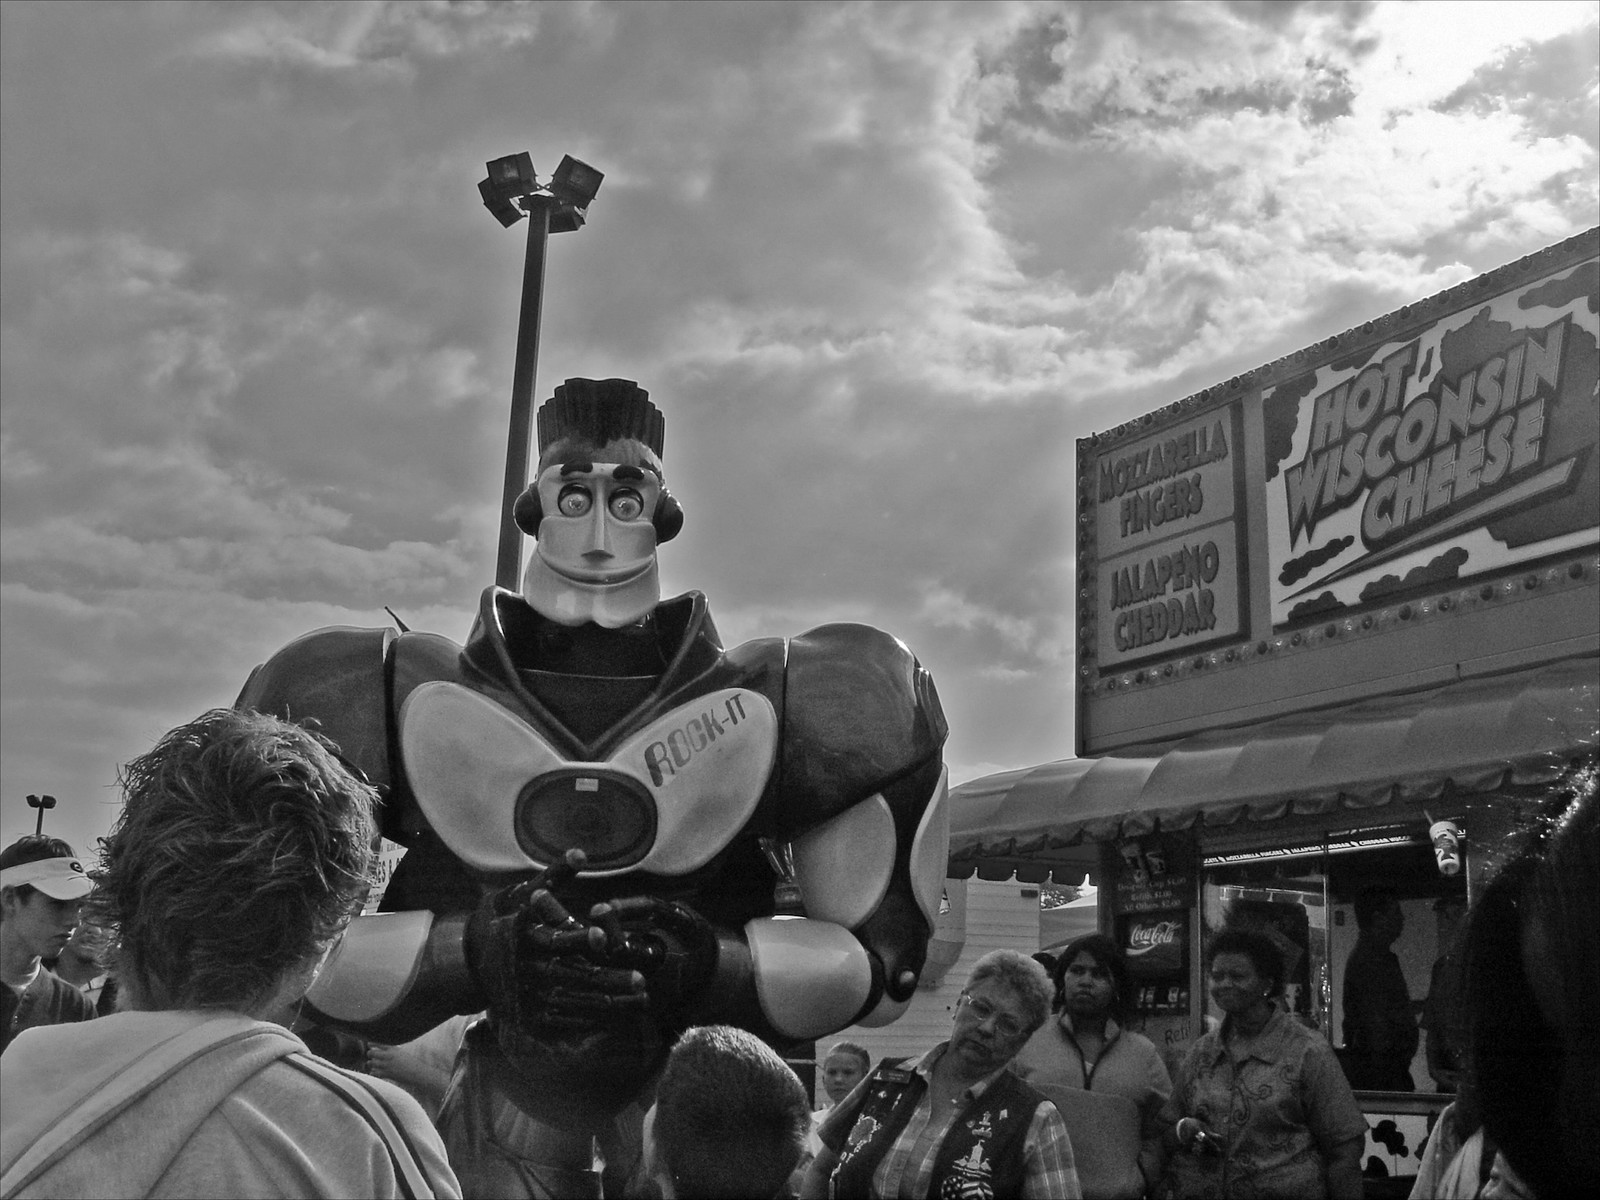 Rock-it Robot, GA National Fair, 2006